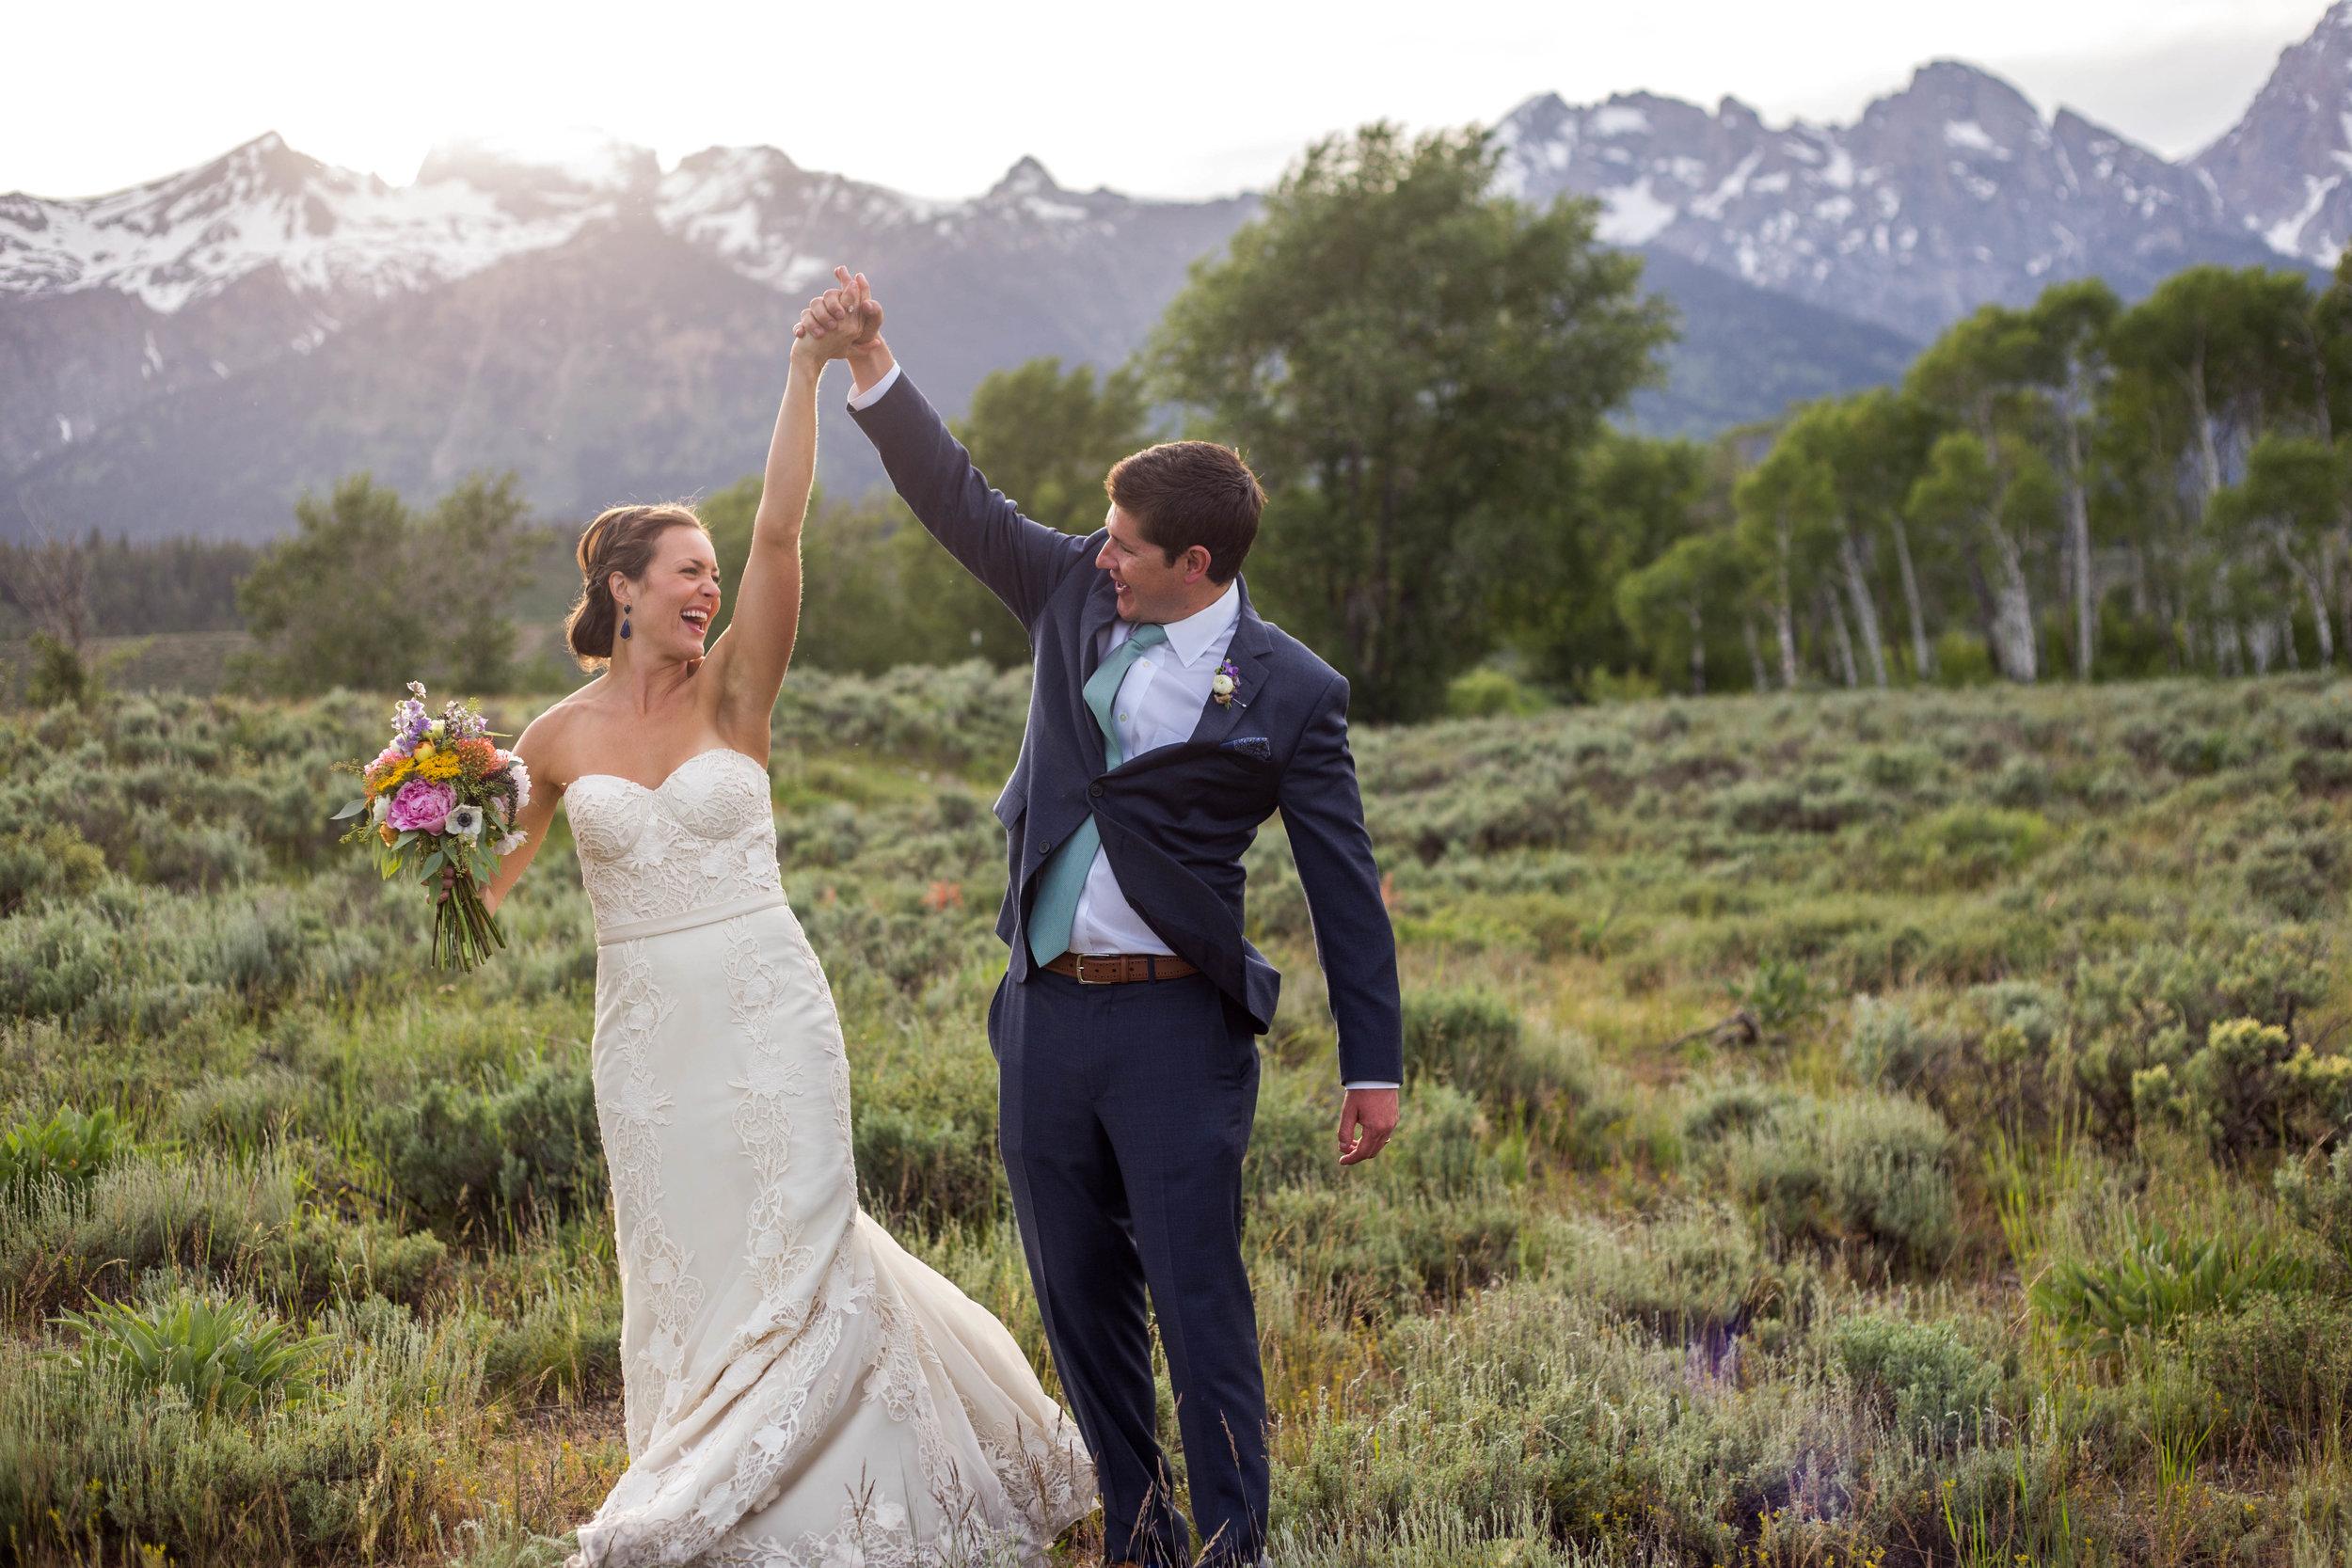 Kendall | Robert Bullock Bride gown |  Sarah Averill Photography